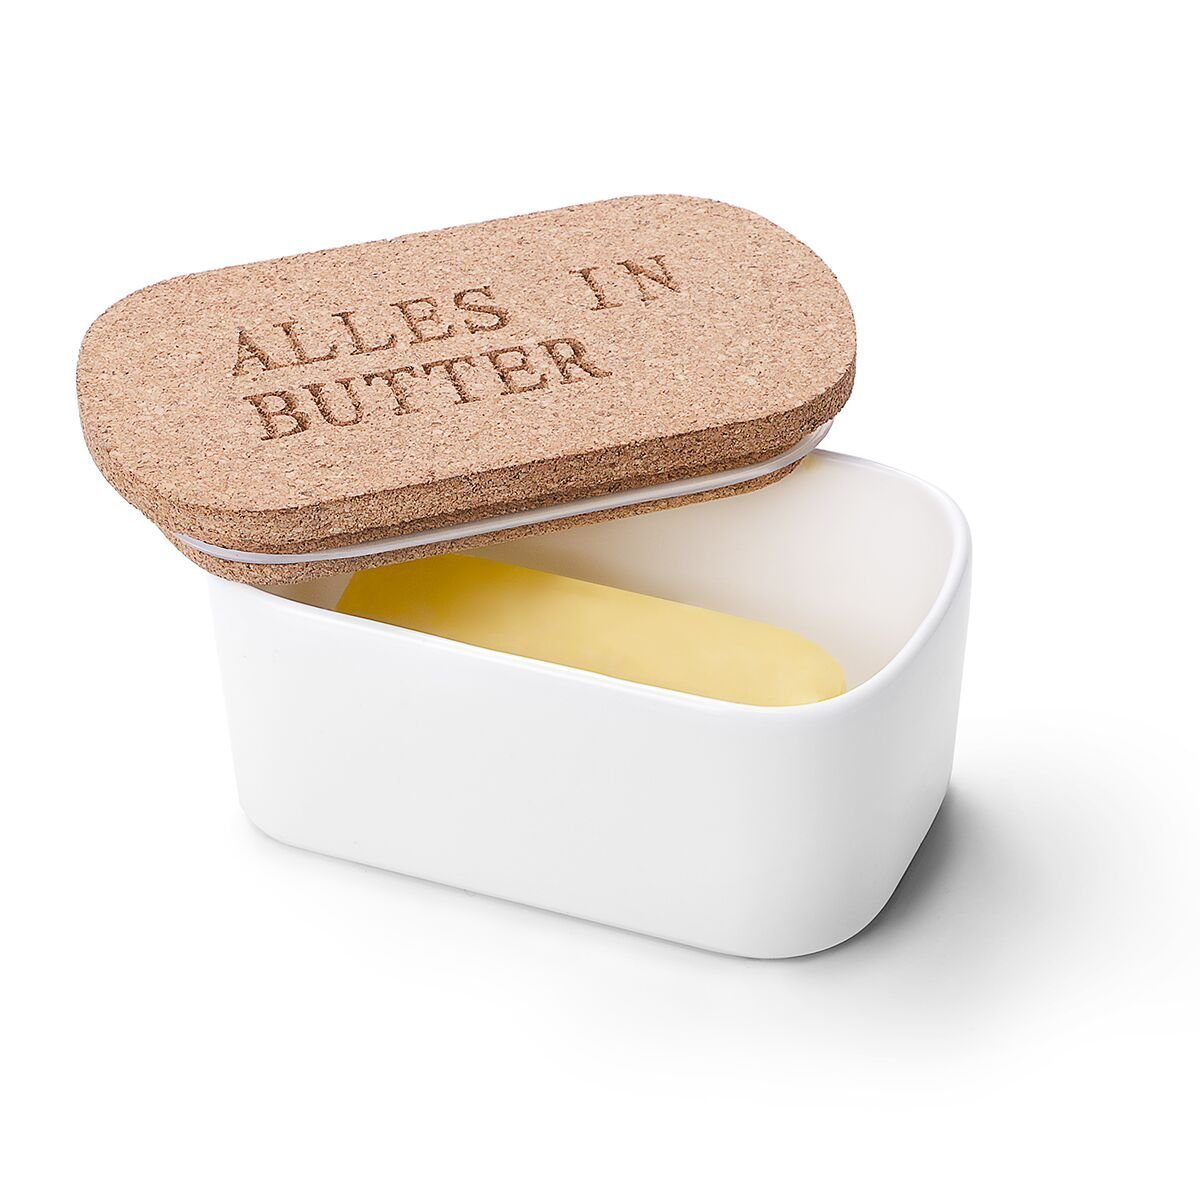 SWEESE mantequilla plato - porcelana Keeper con tapa de corcho ...